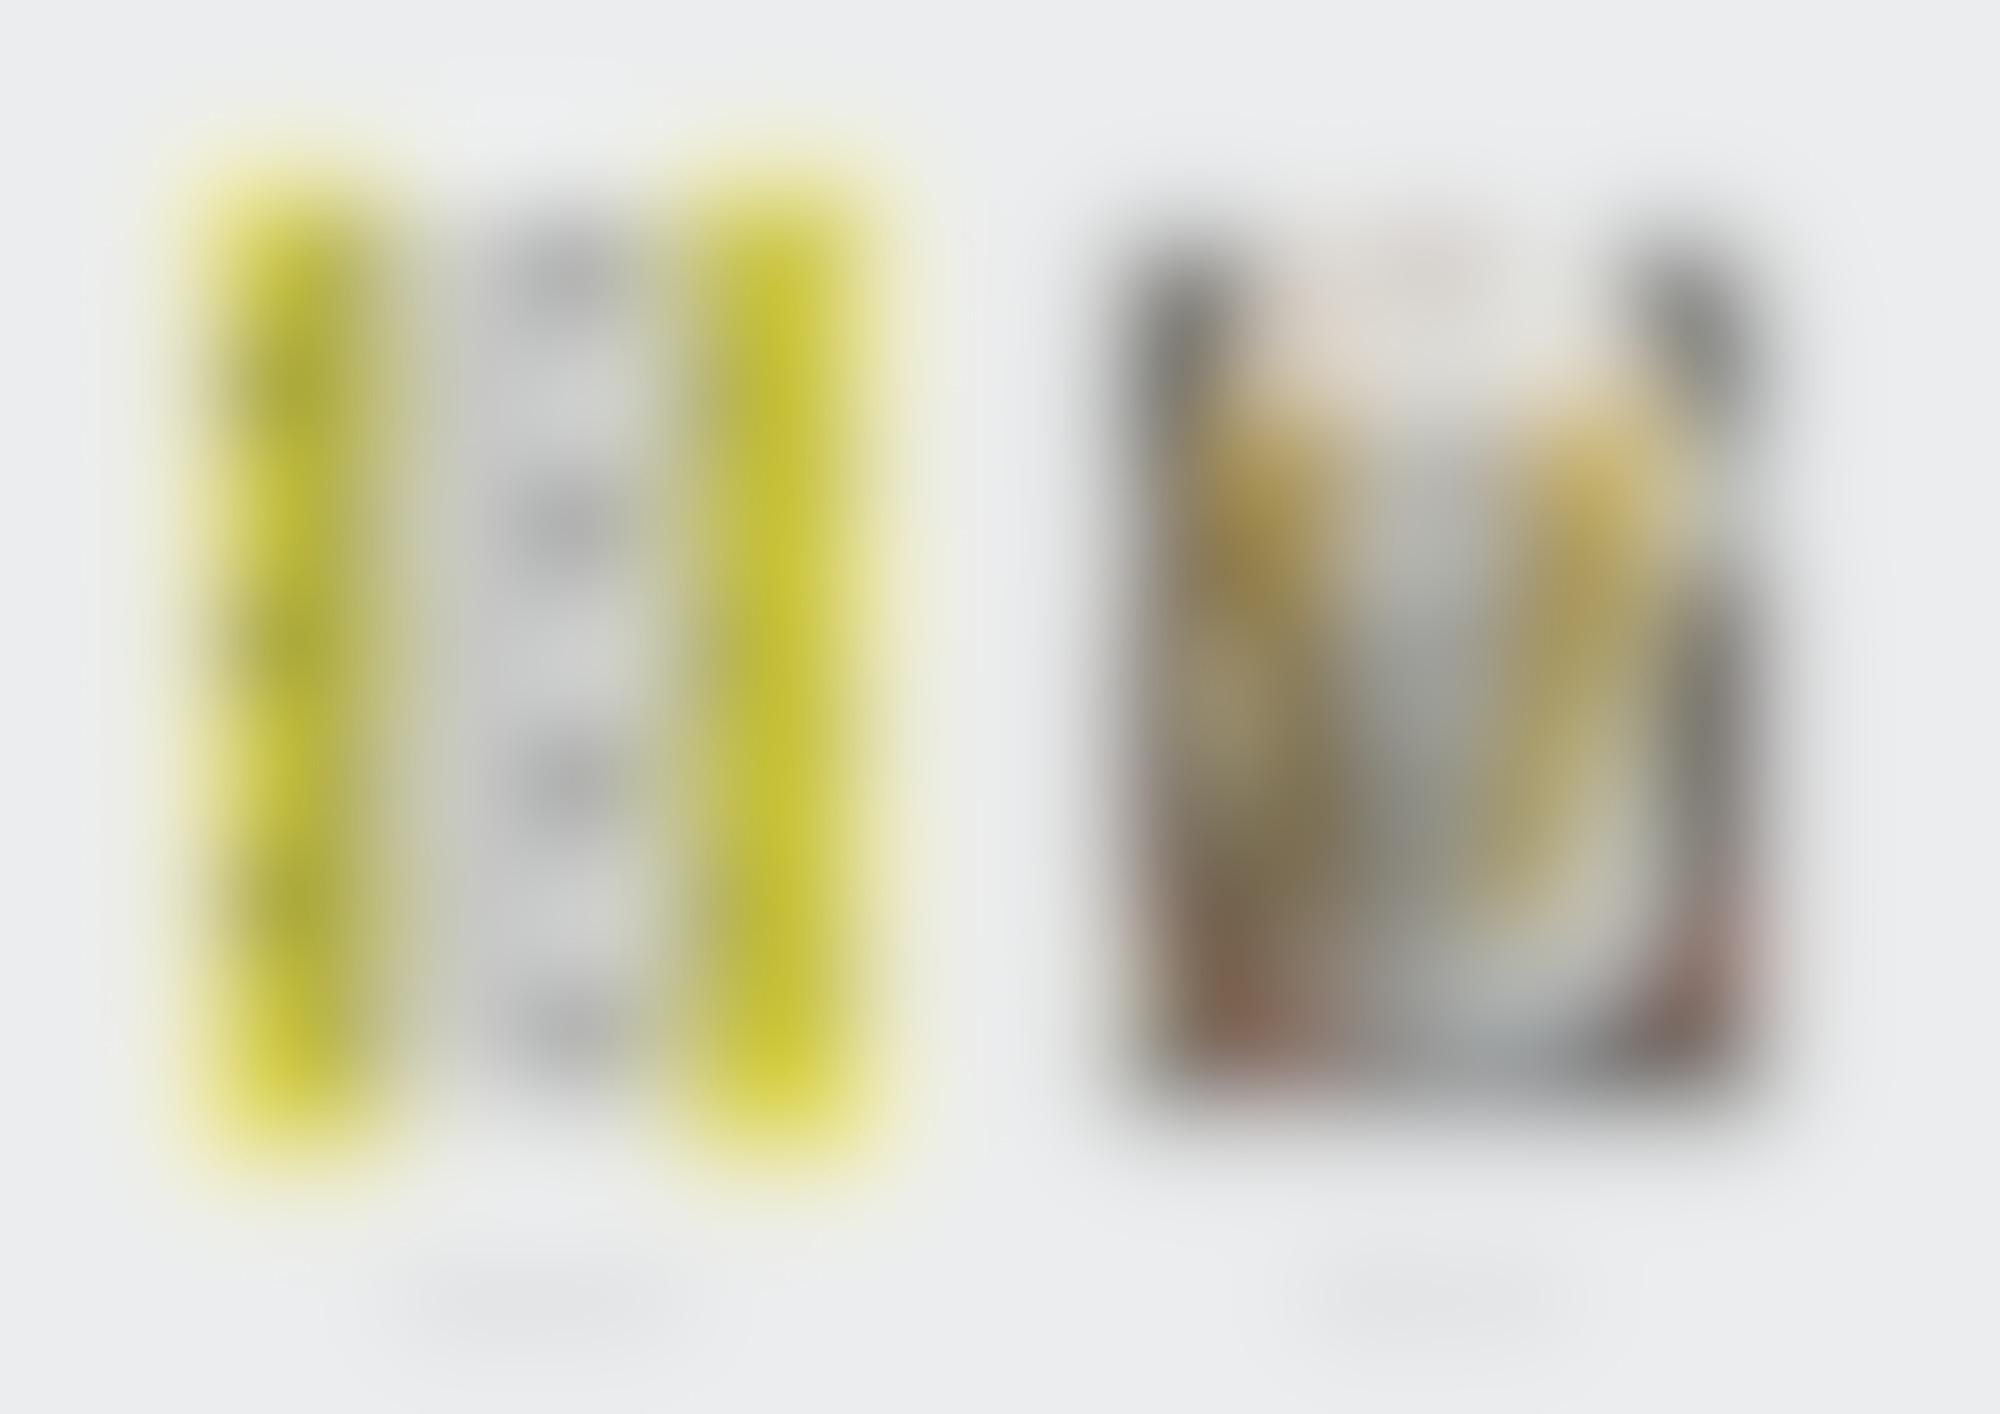 Anthony Burrill copied 4 autocompressfitresizeixlibphp 1 1 0max h2000max w3 D2000q80see98072a2631e1370d463960b6672547